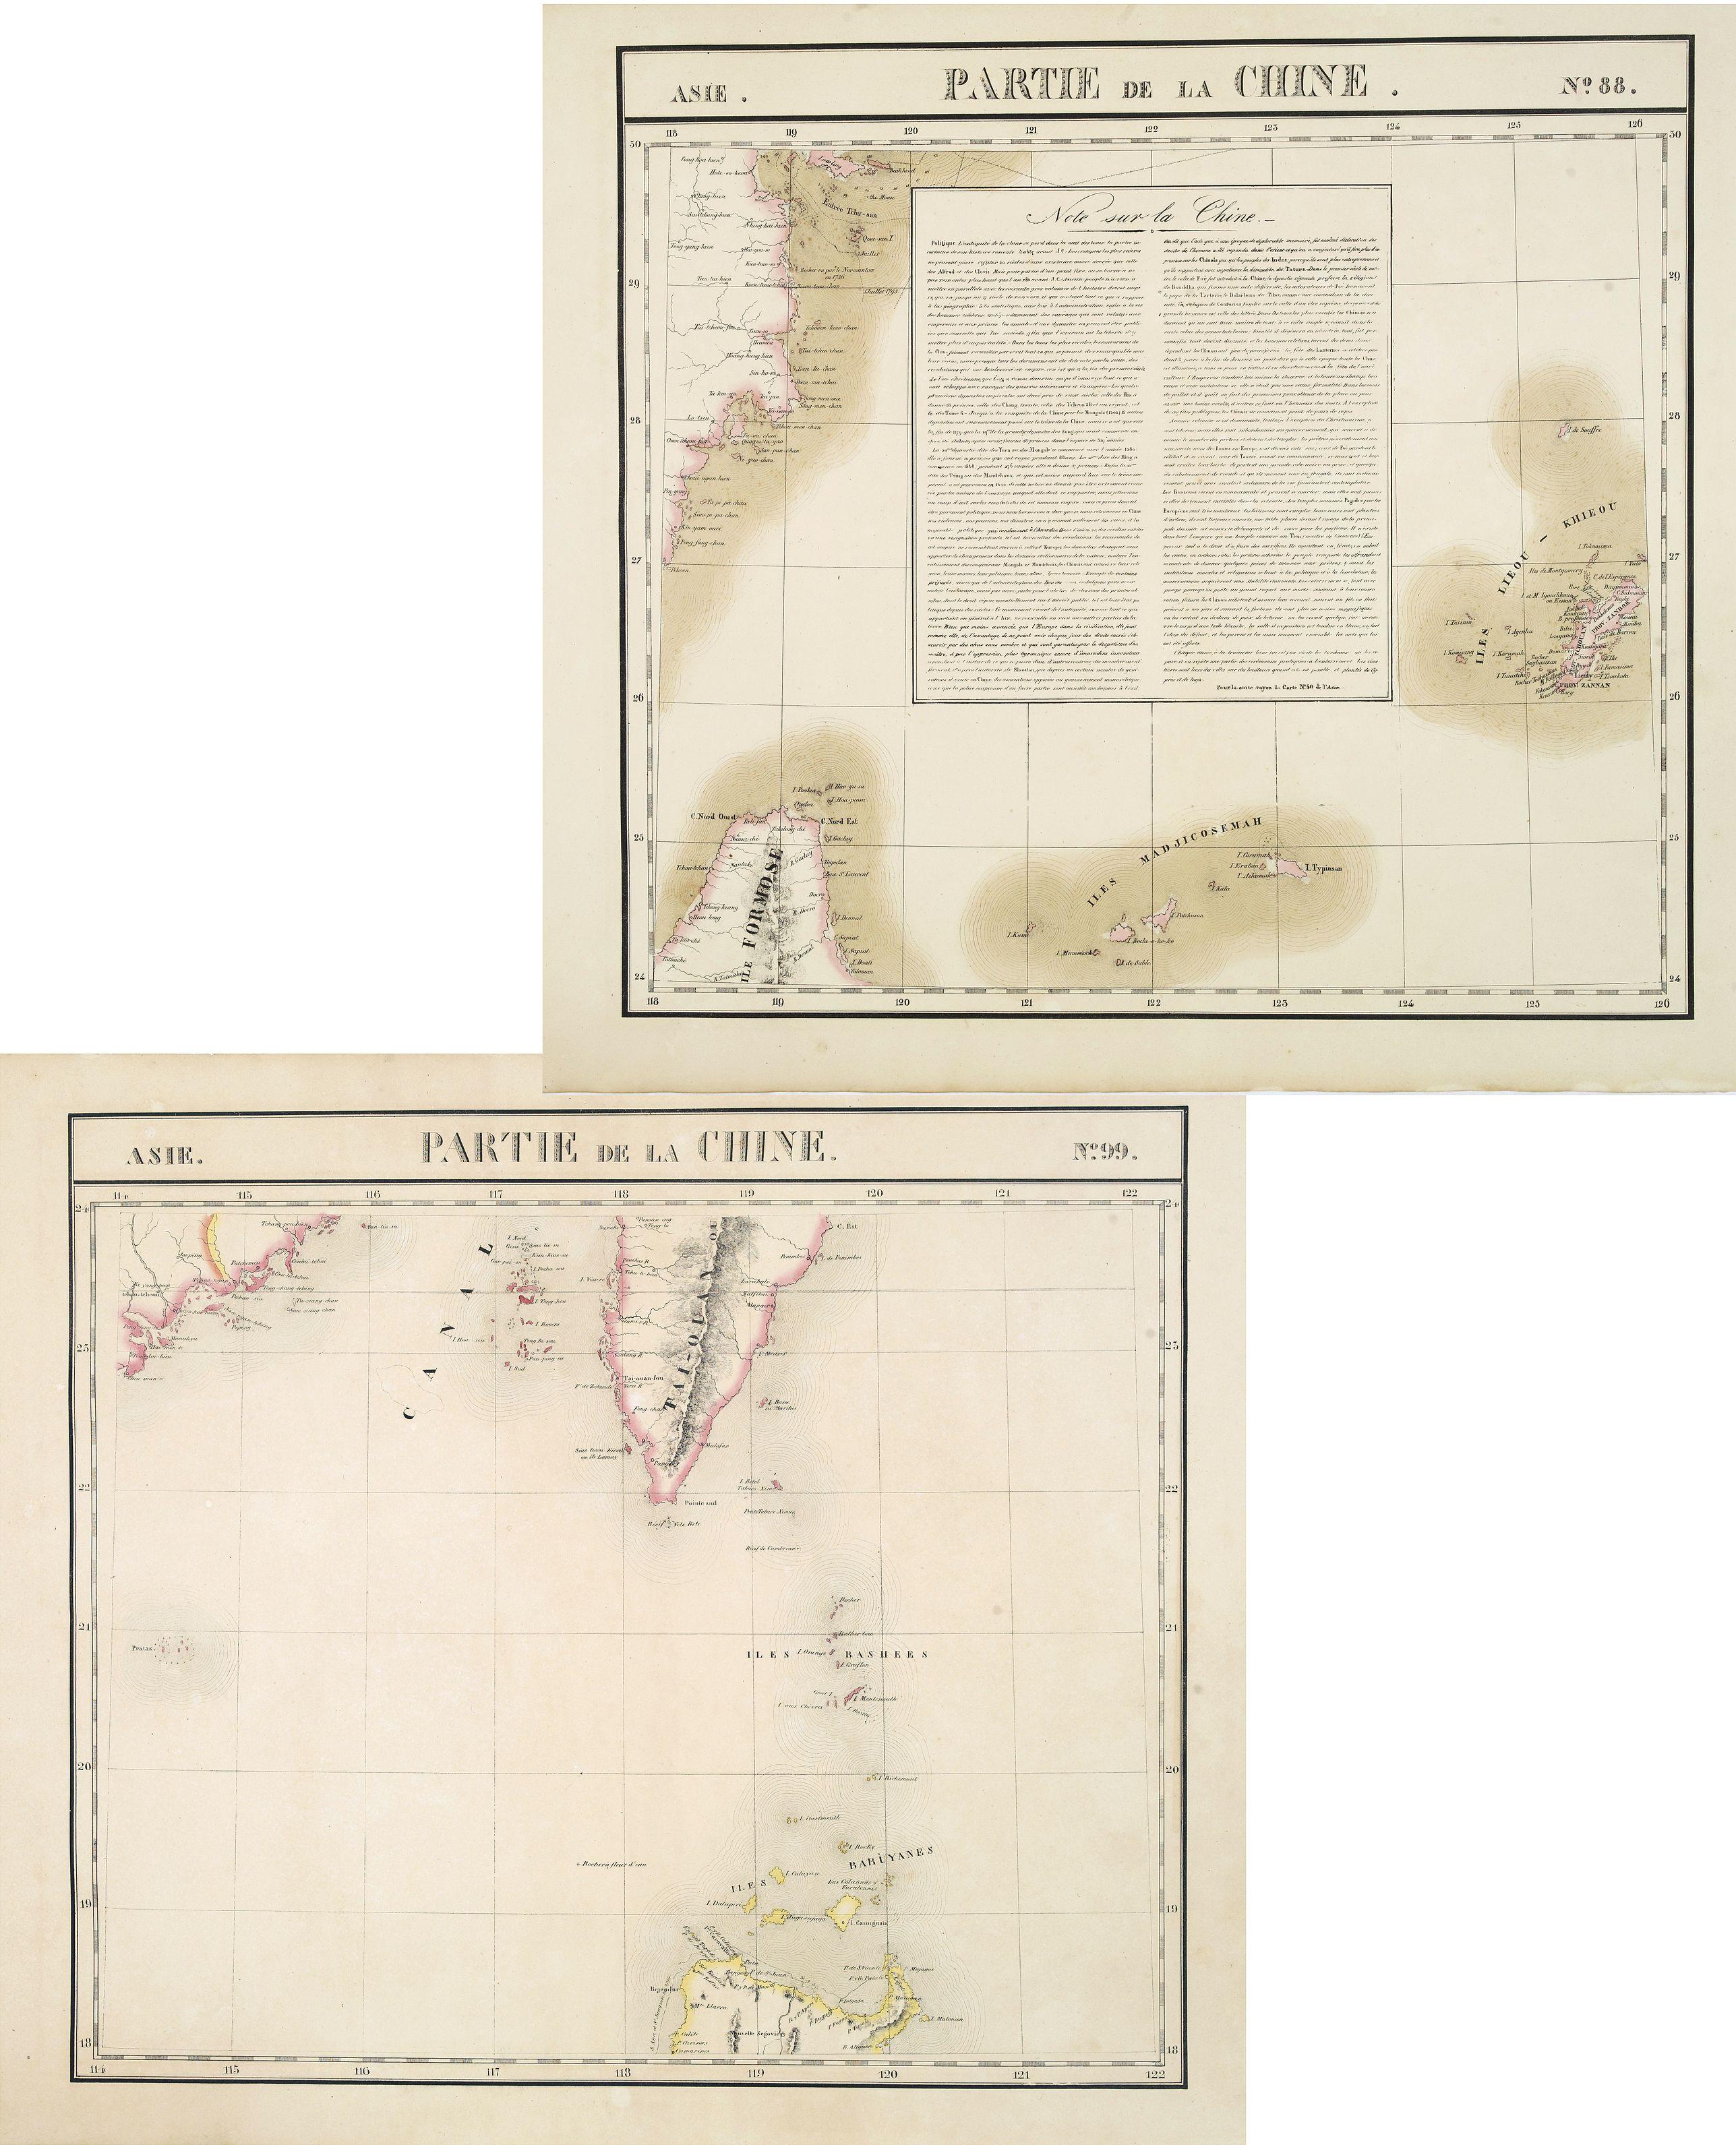 VANDERMAELEN, Ph. -  [2 sheets] Partie de la Chine. N°.88, 99.